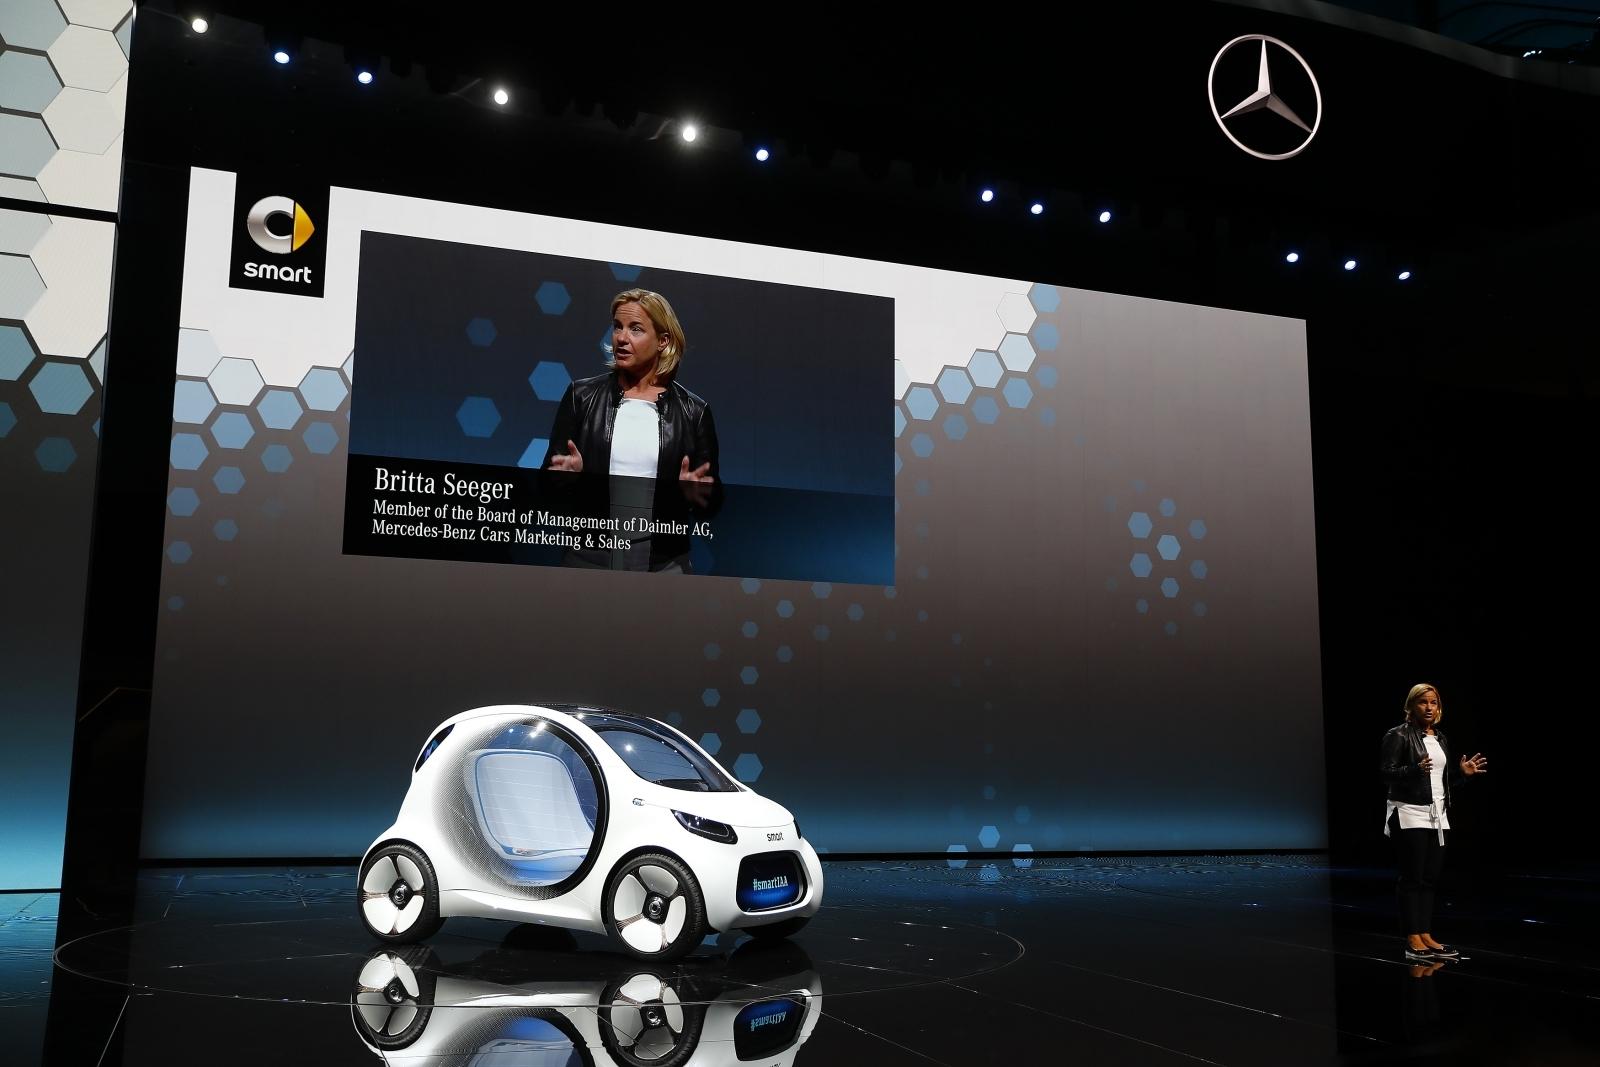 Smart electric car